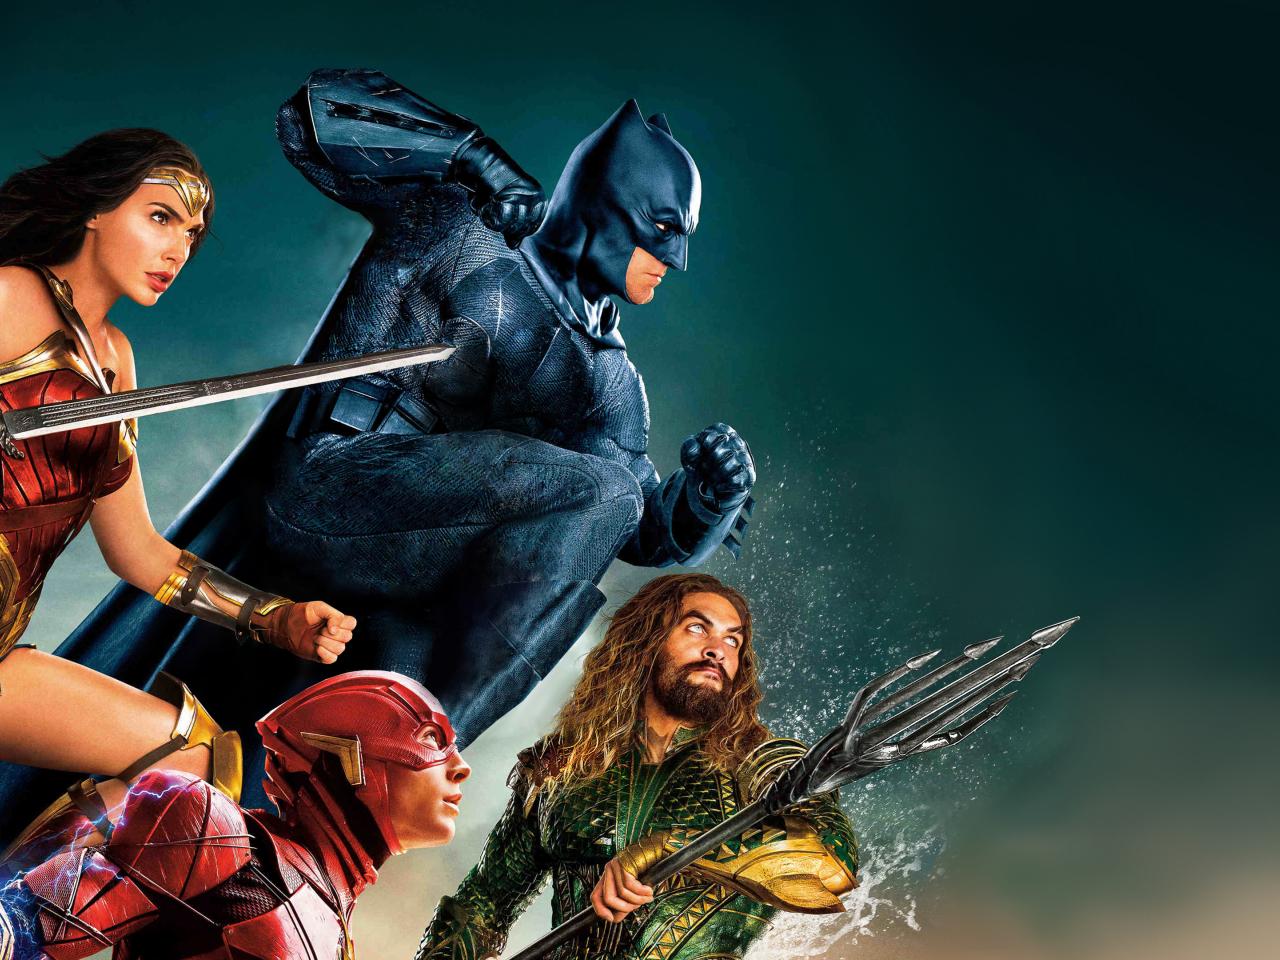 Justice league, movie, superheroes, 1280x960 wallpaper